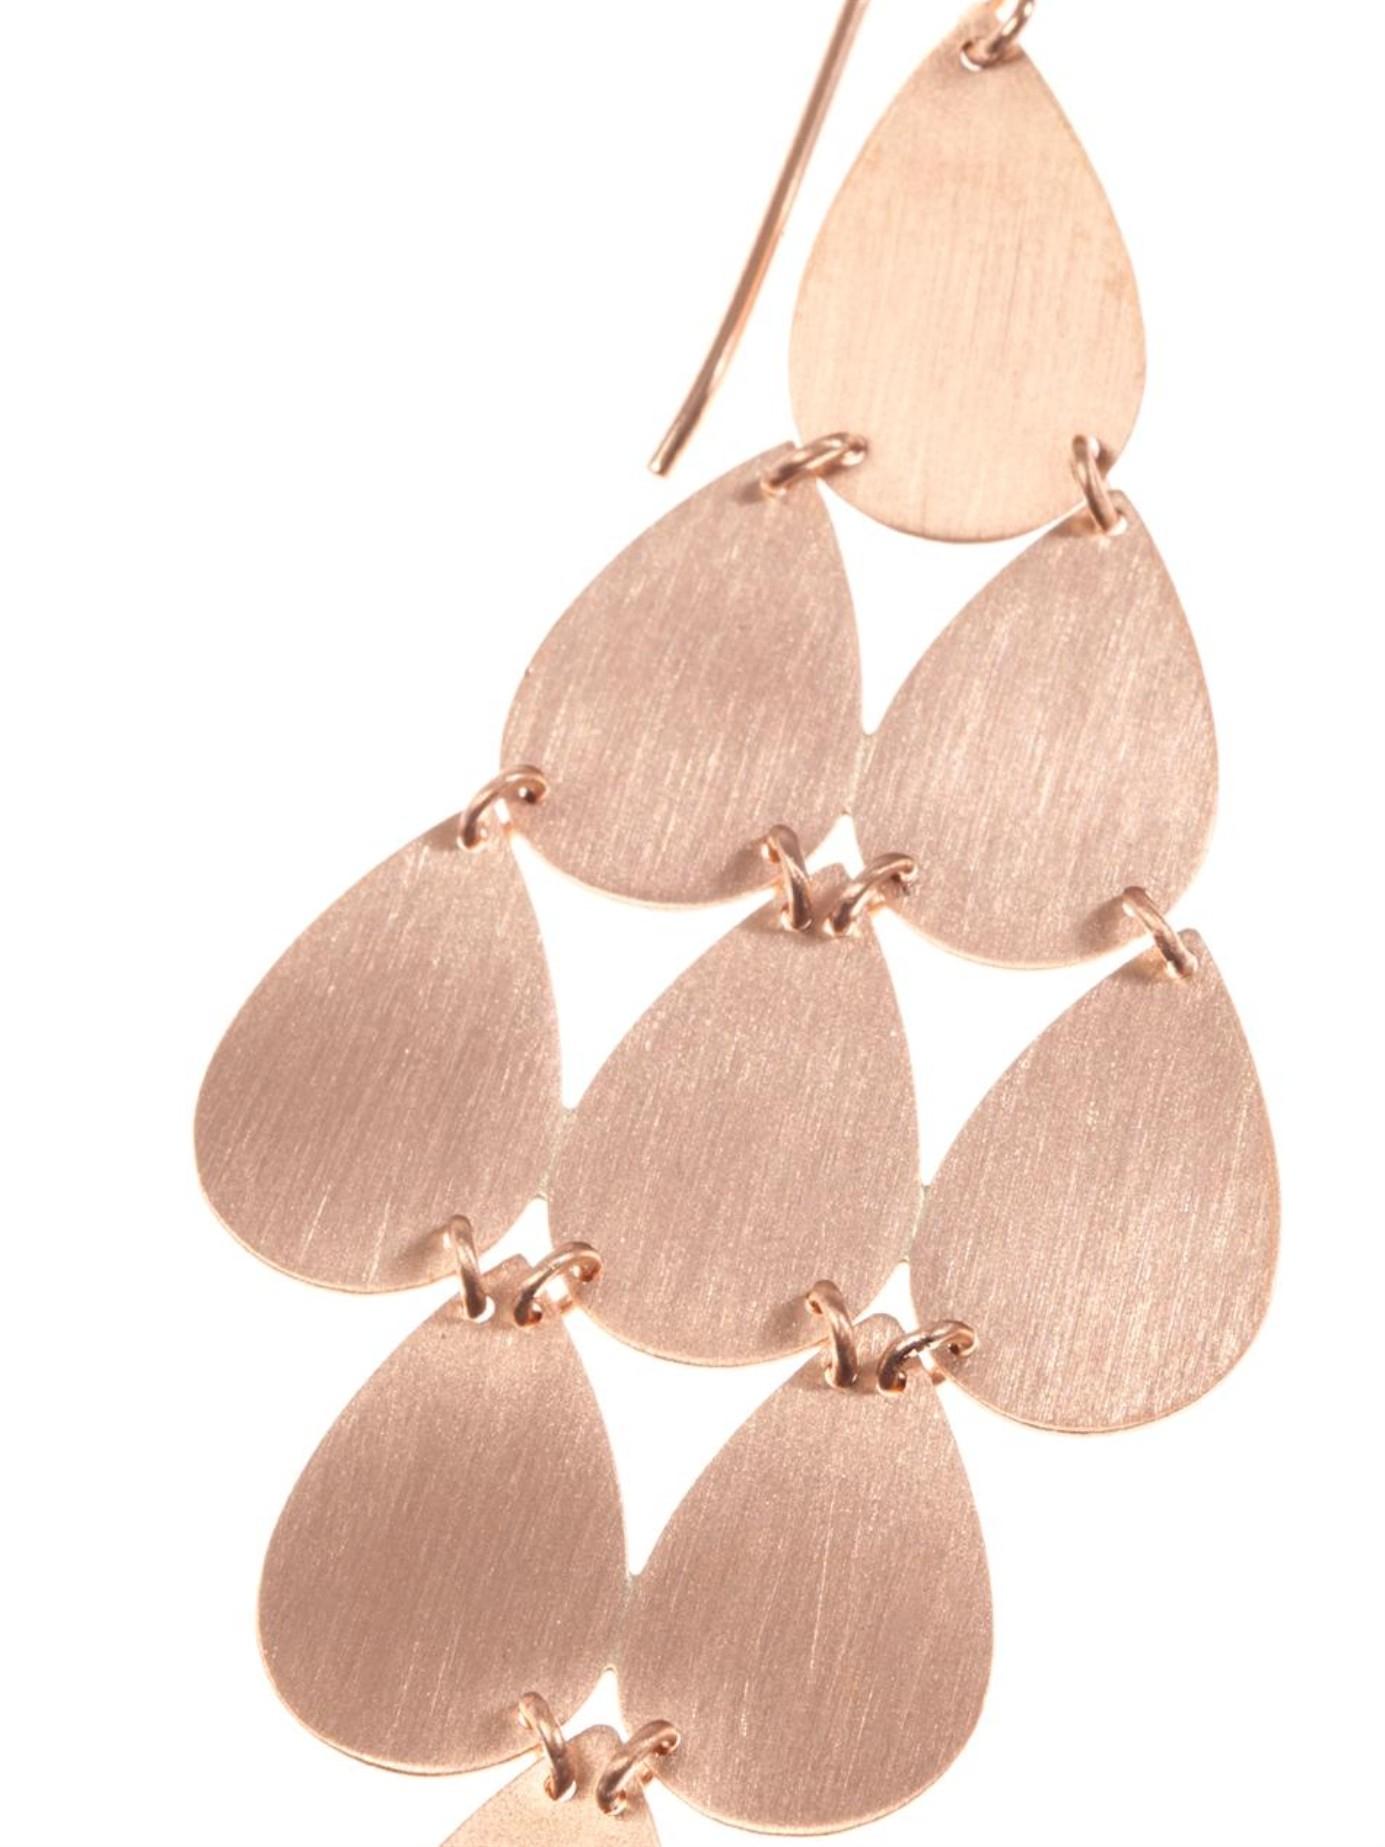 Irene neuwirth Rose Gold Chandelier Earrings in Pink